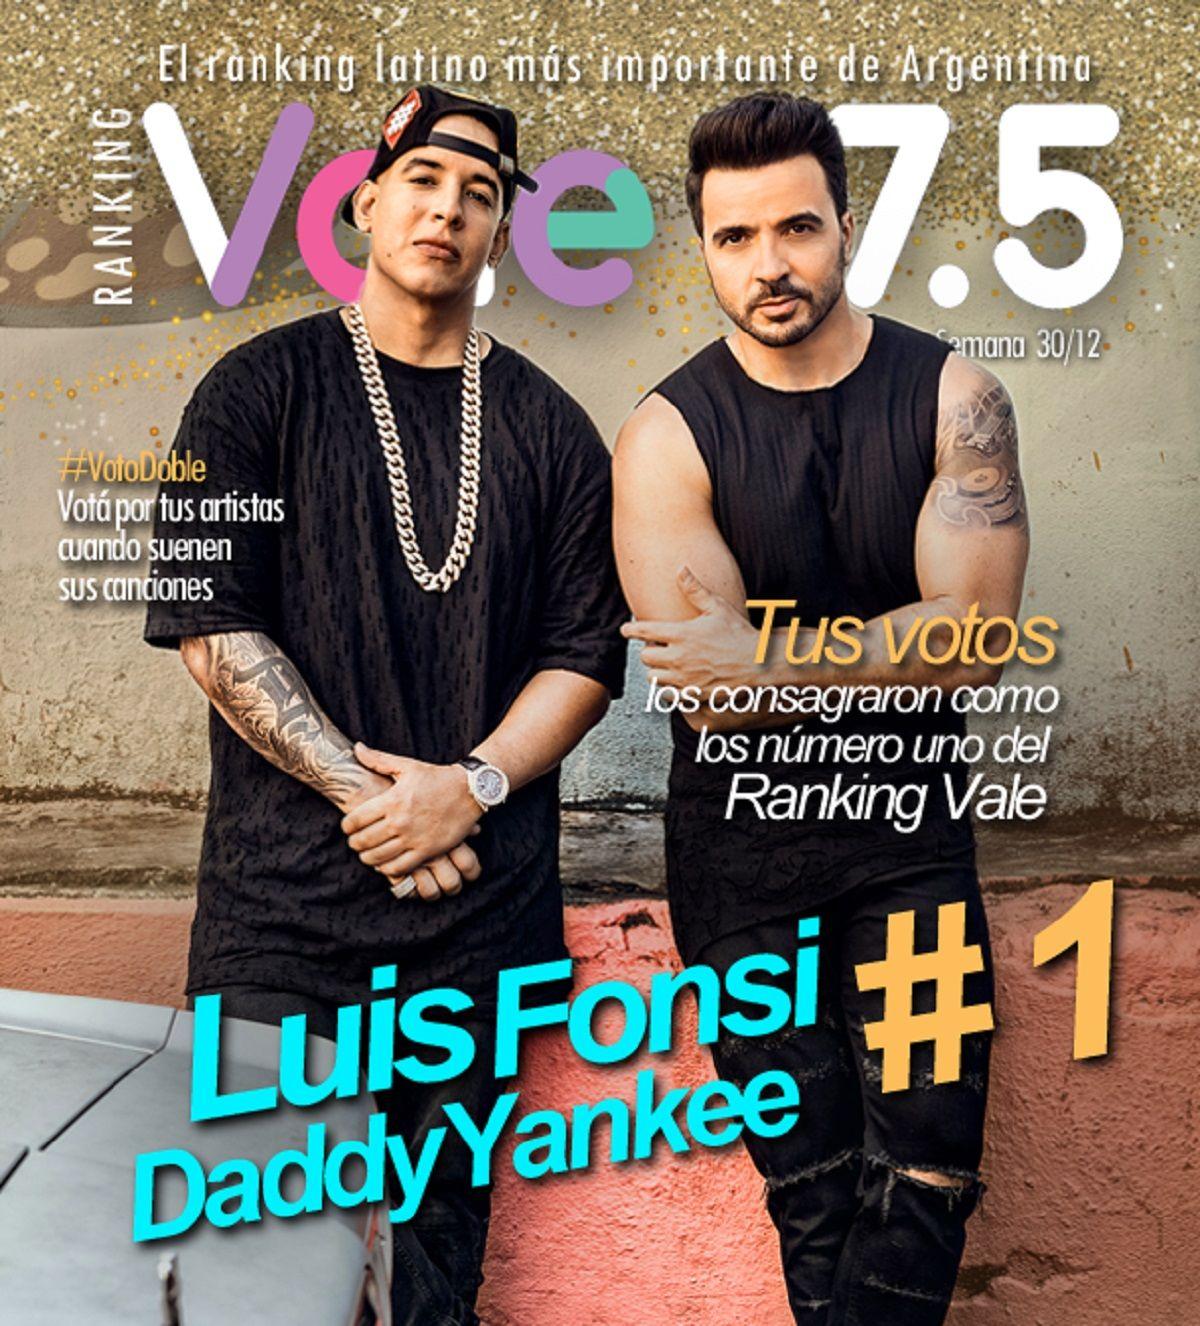 Luis Fonsi y Daddy Yankee, los reyes del Ranking Vale en el 2017